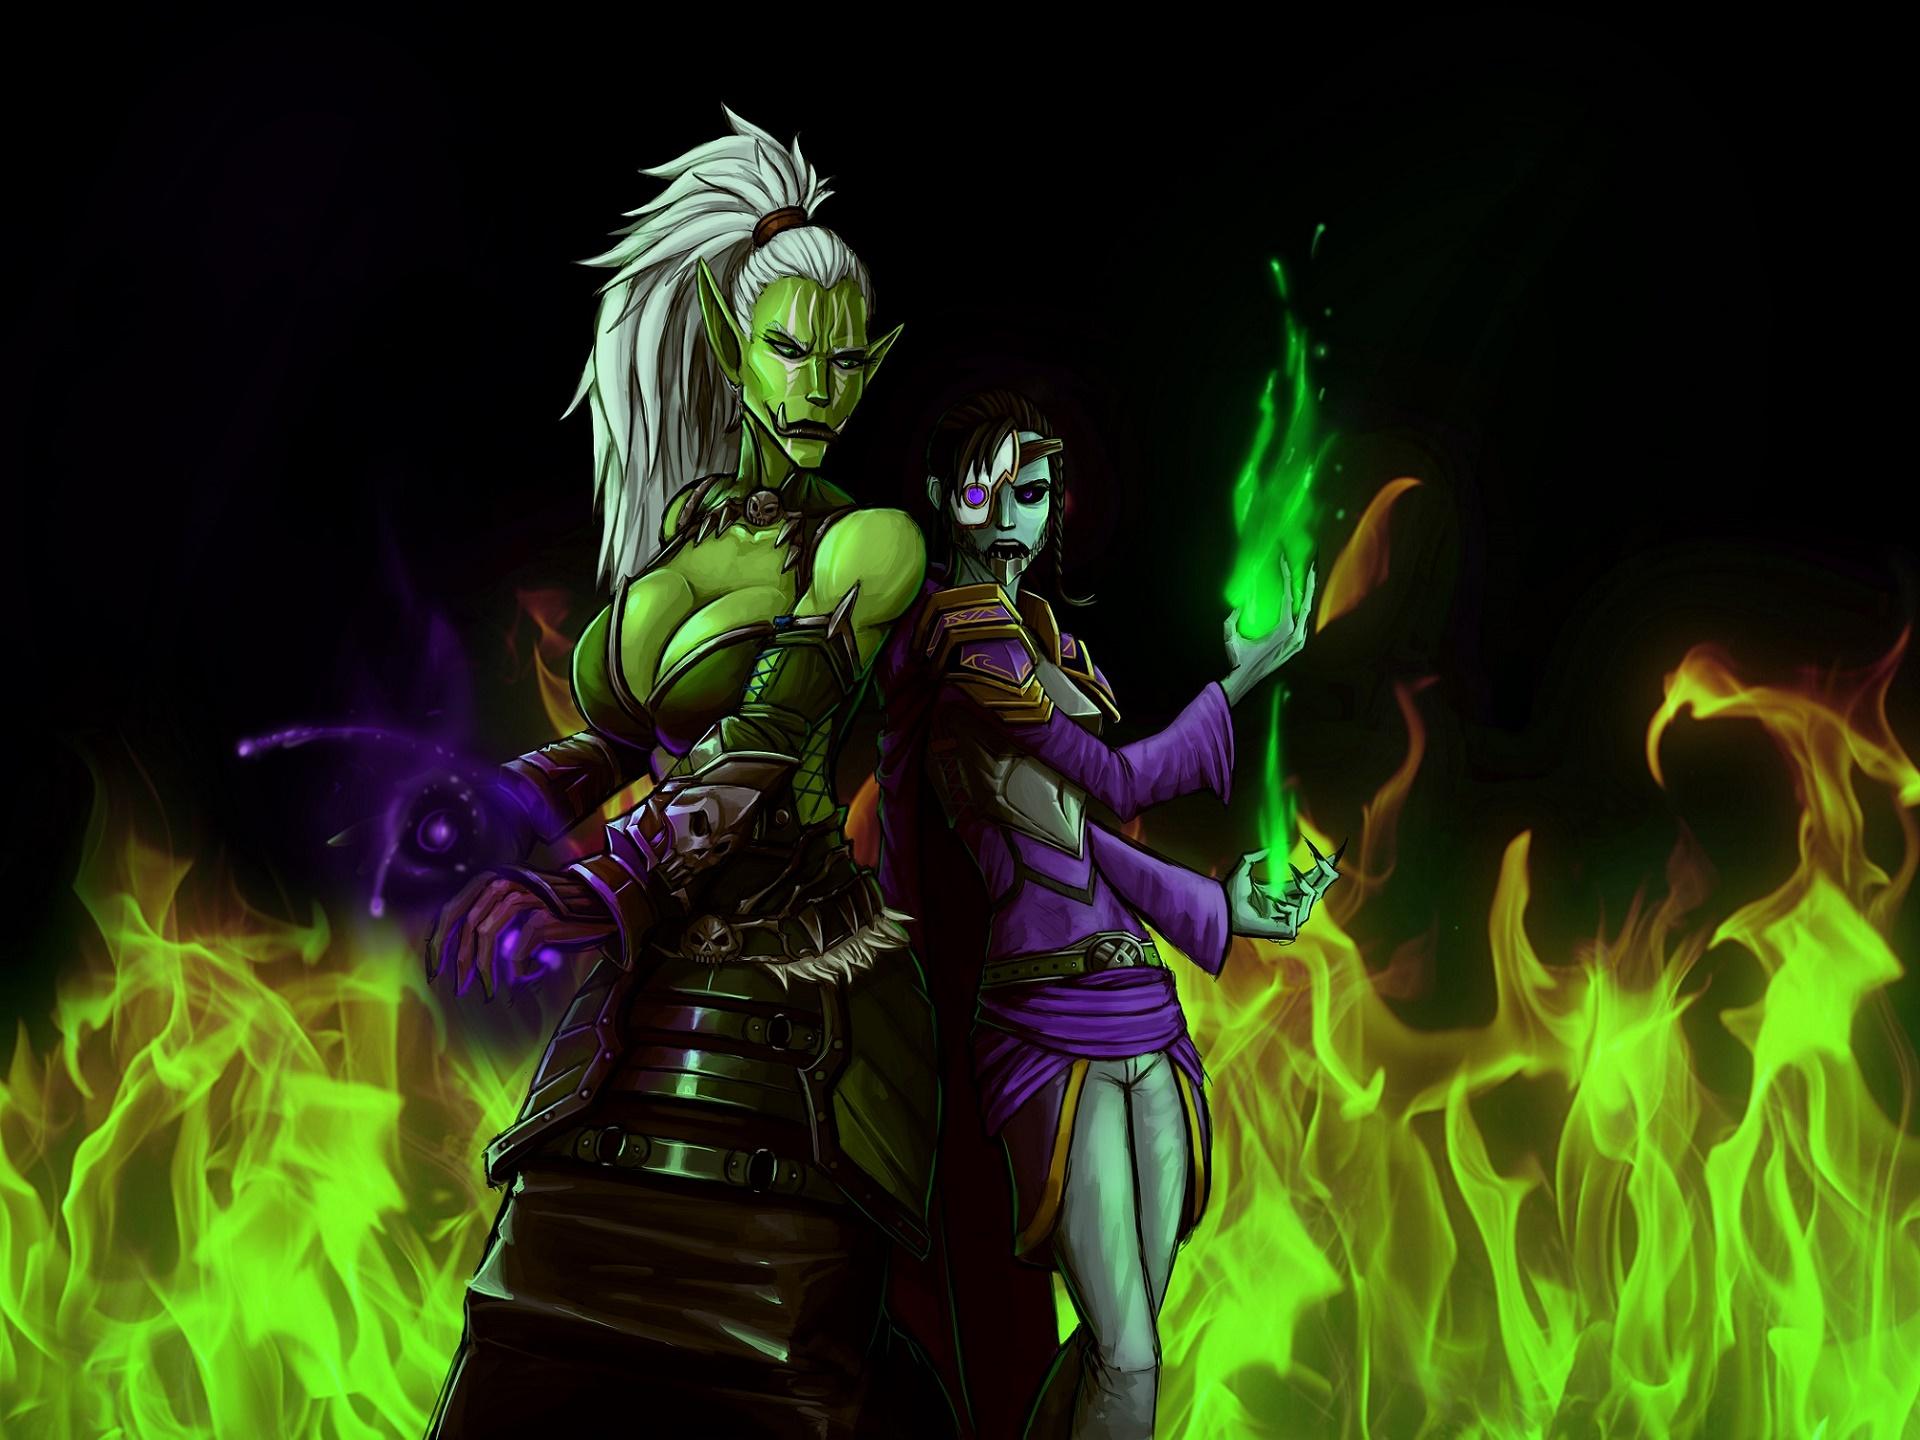 Dark Shadows and Jade Fires